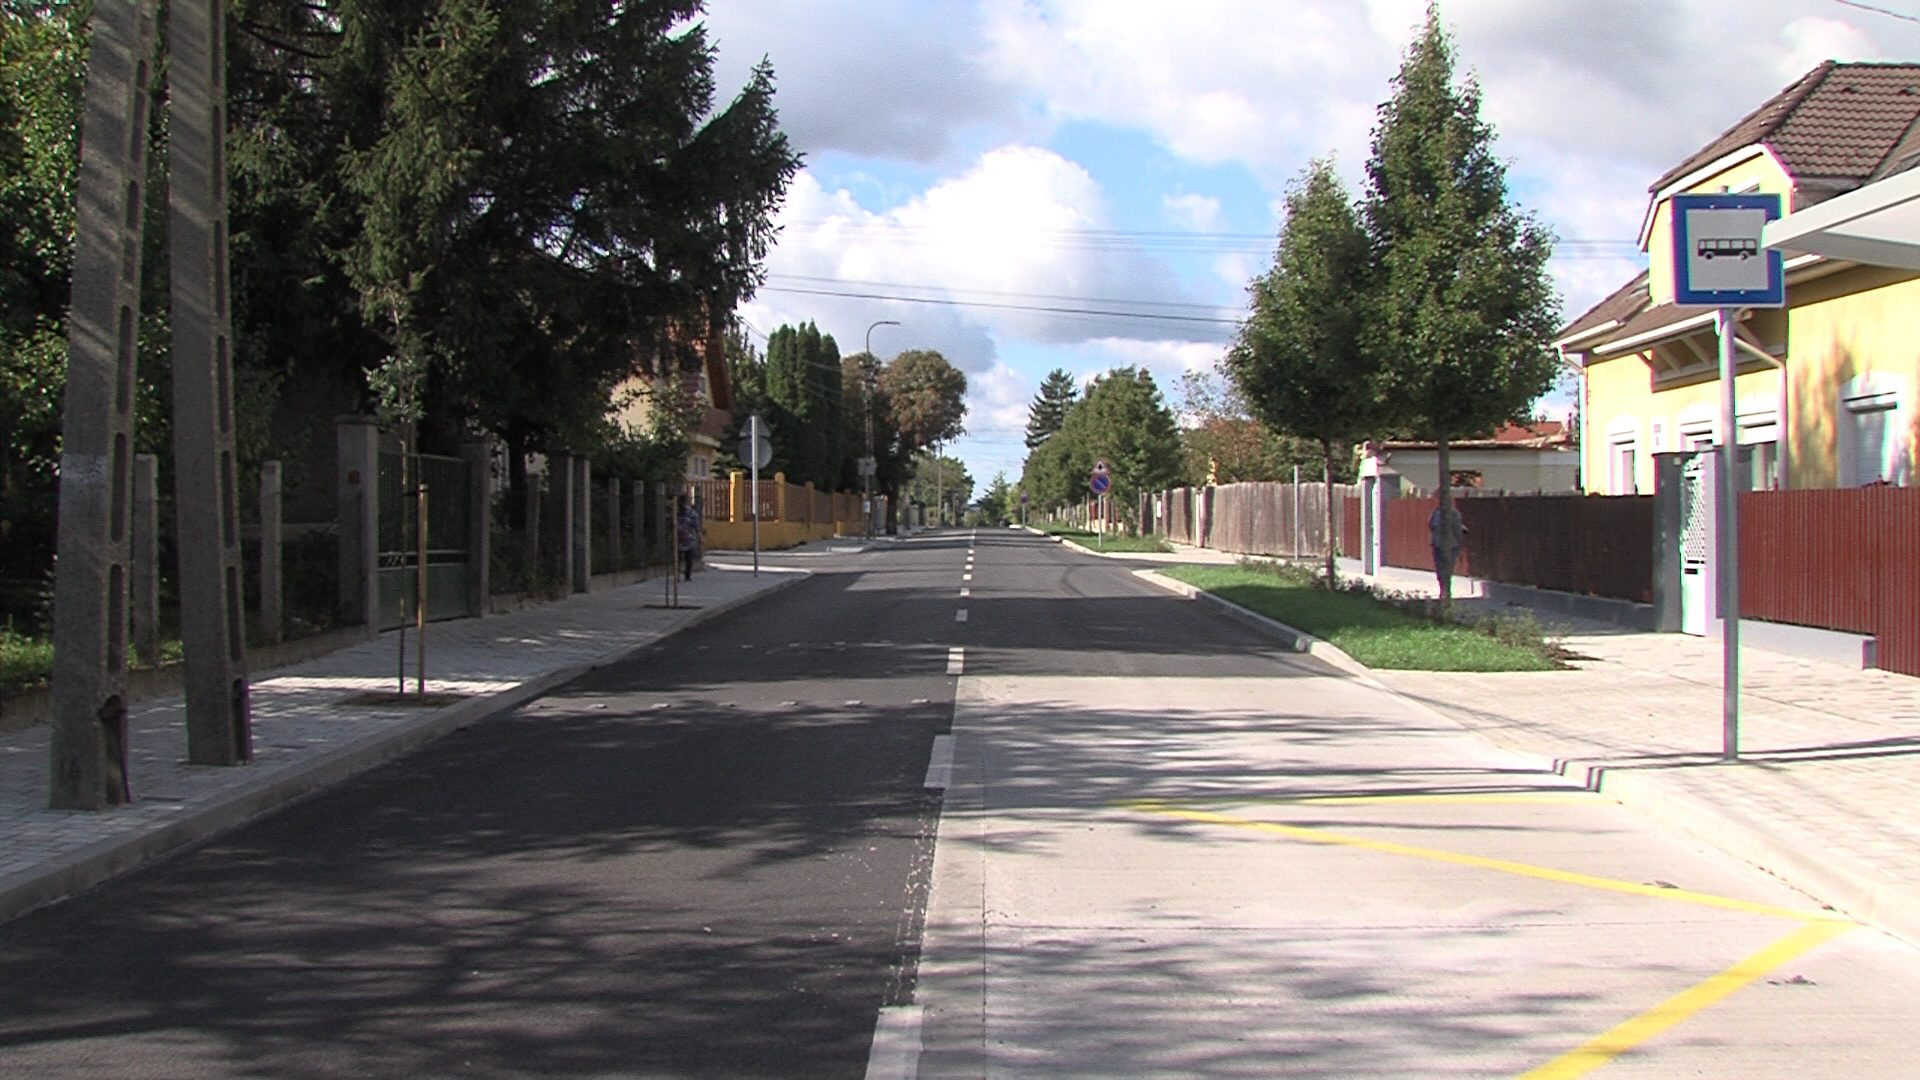 Megújult a Petőfi utca